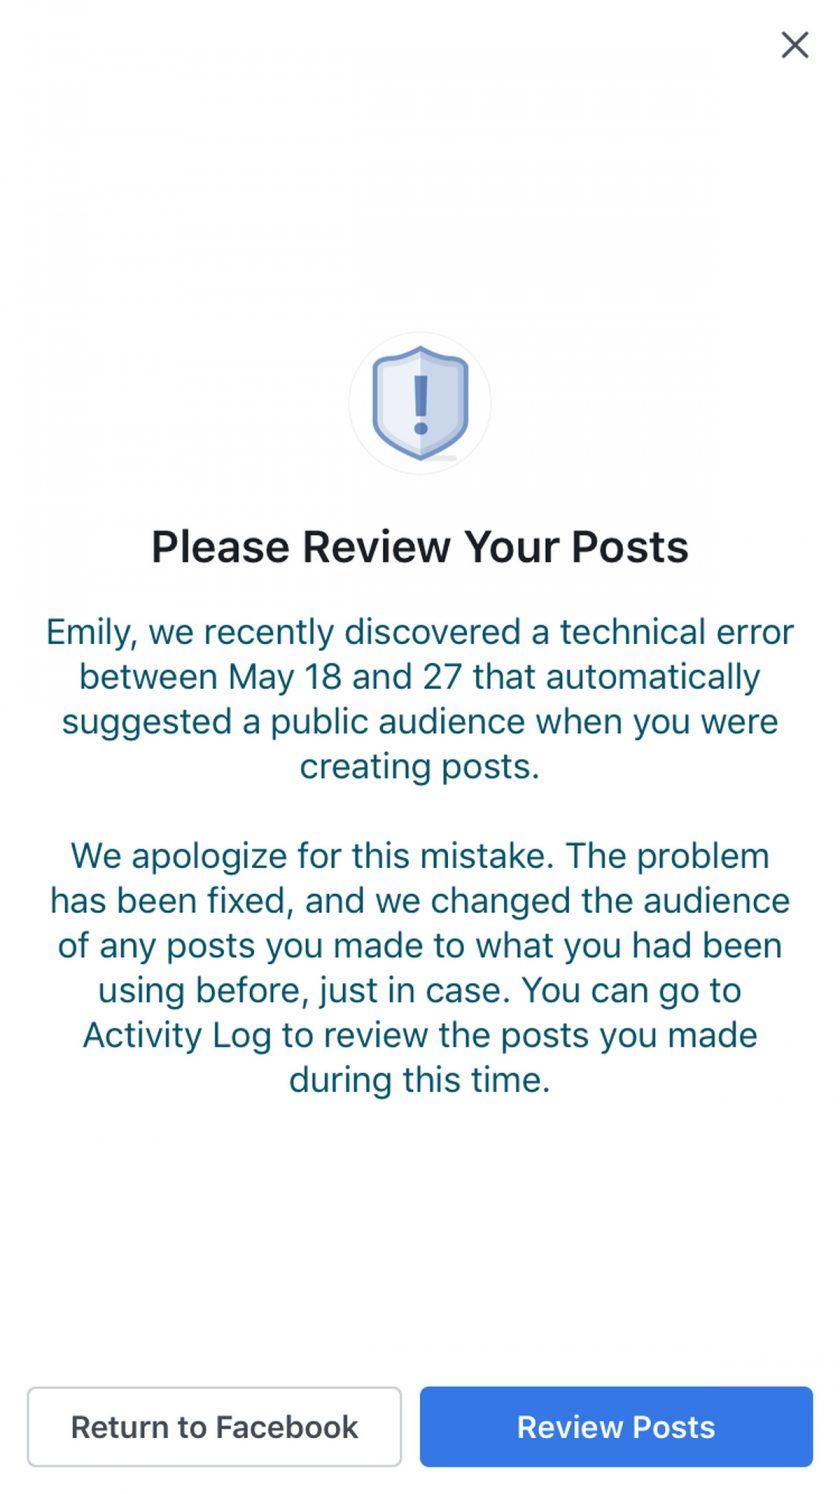 Facebook Memberitahukan 14 Juta Orang Tentang Serangan 'Bug'